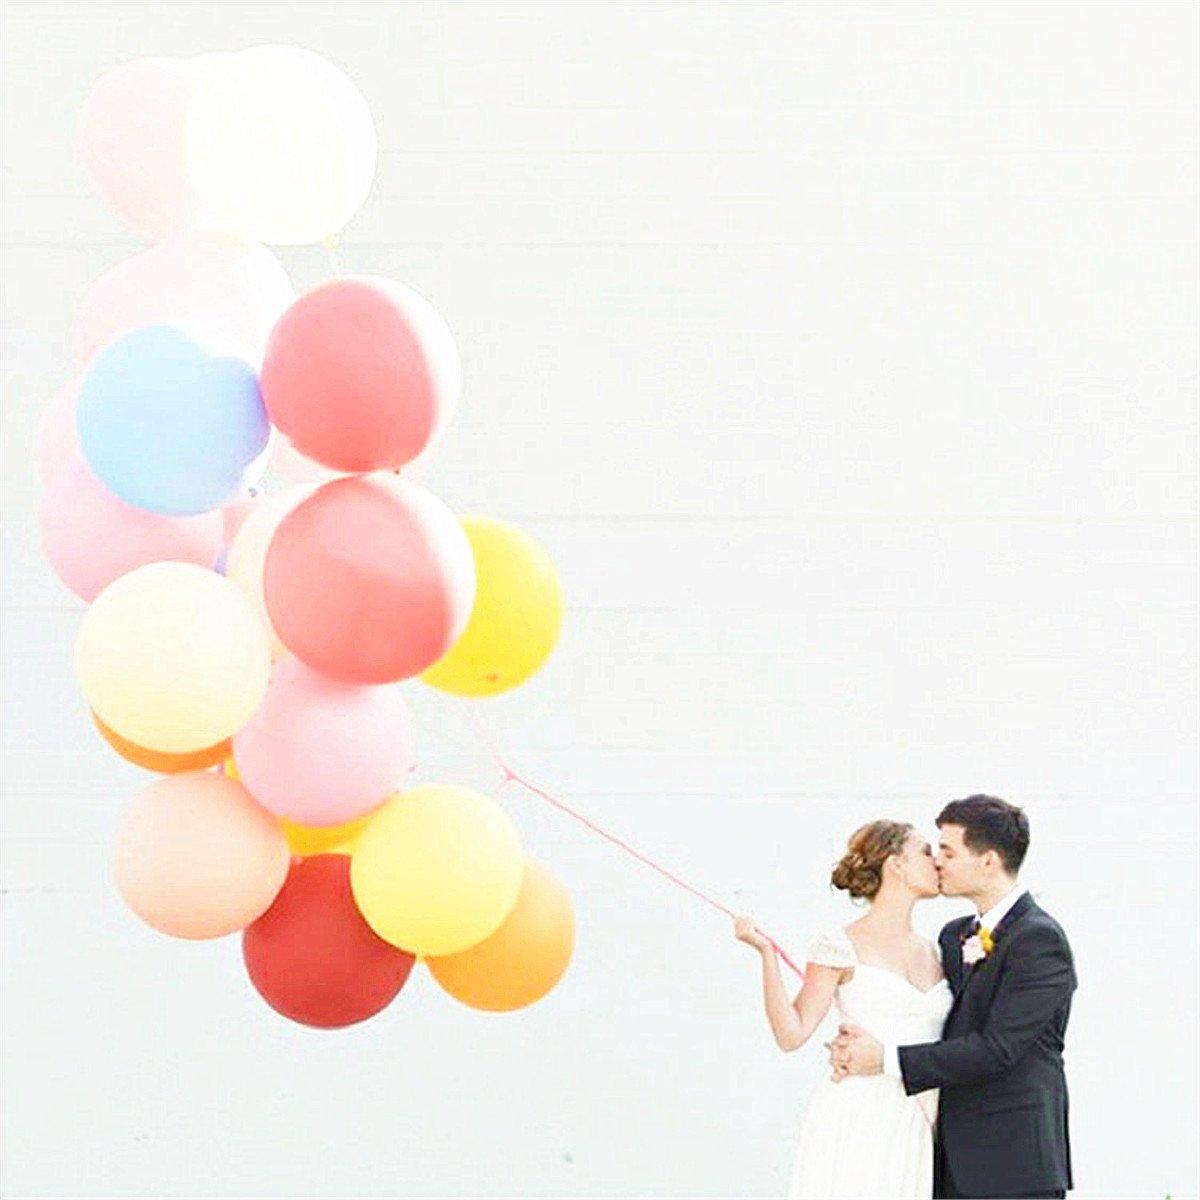 amazon com 20 pcs latex balloons 27 inches12g pc super large